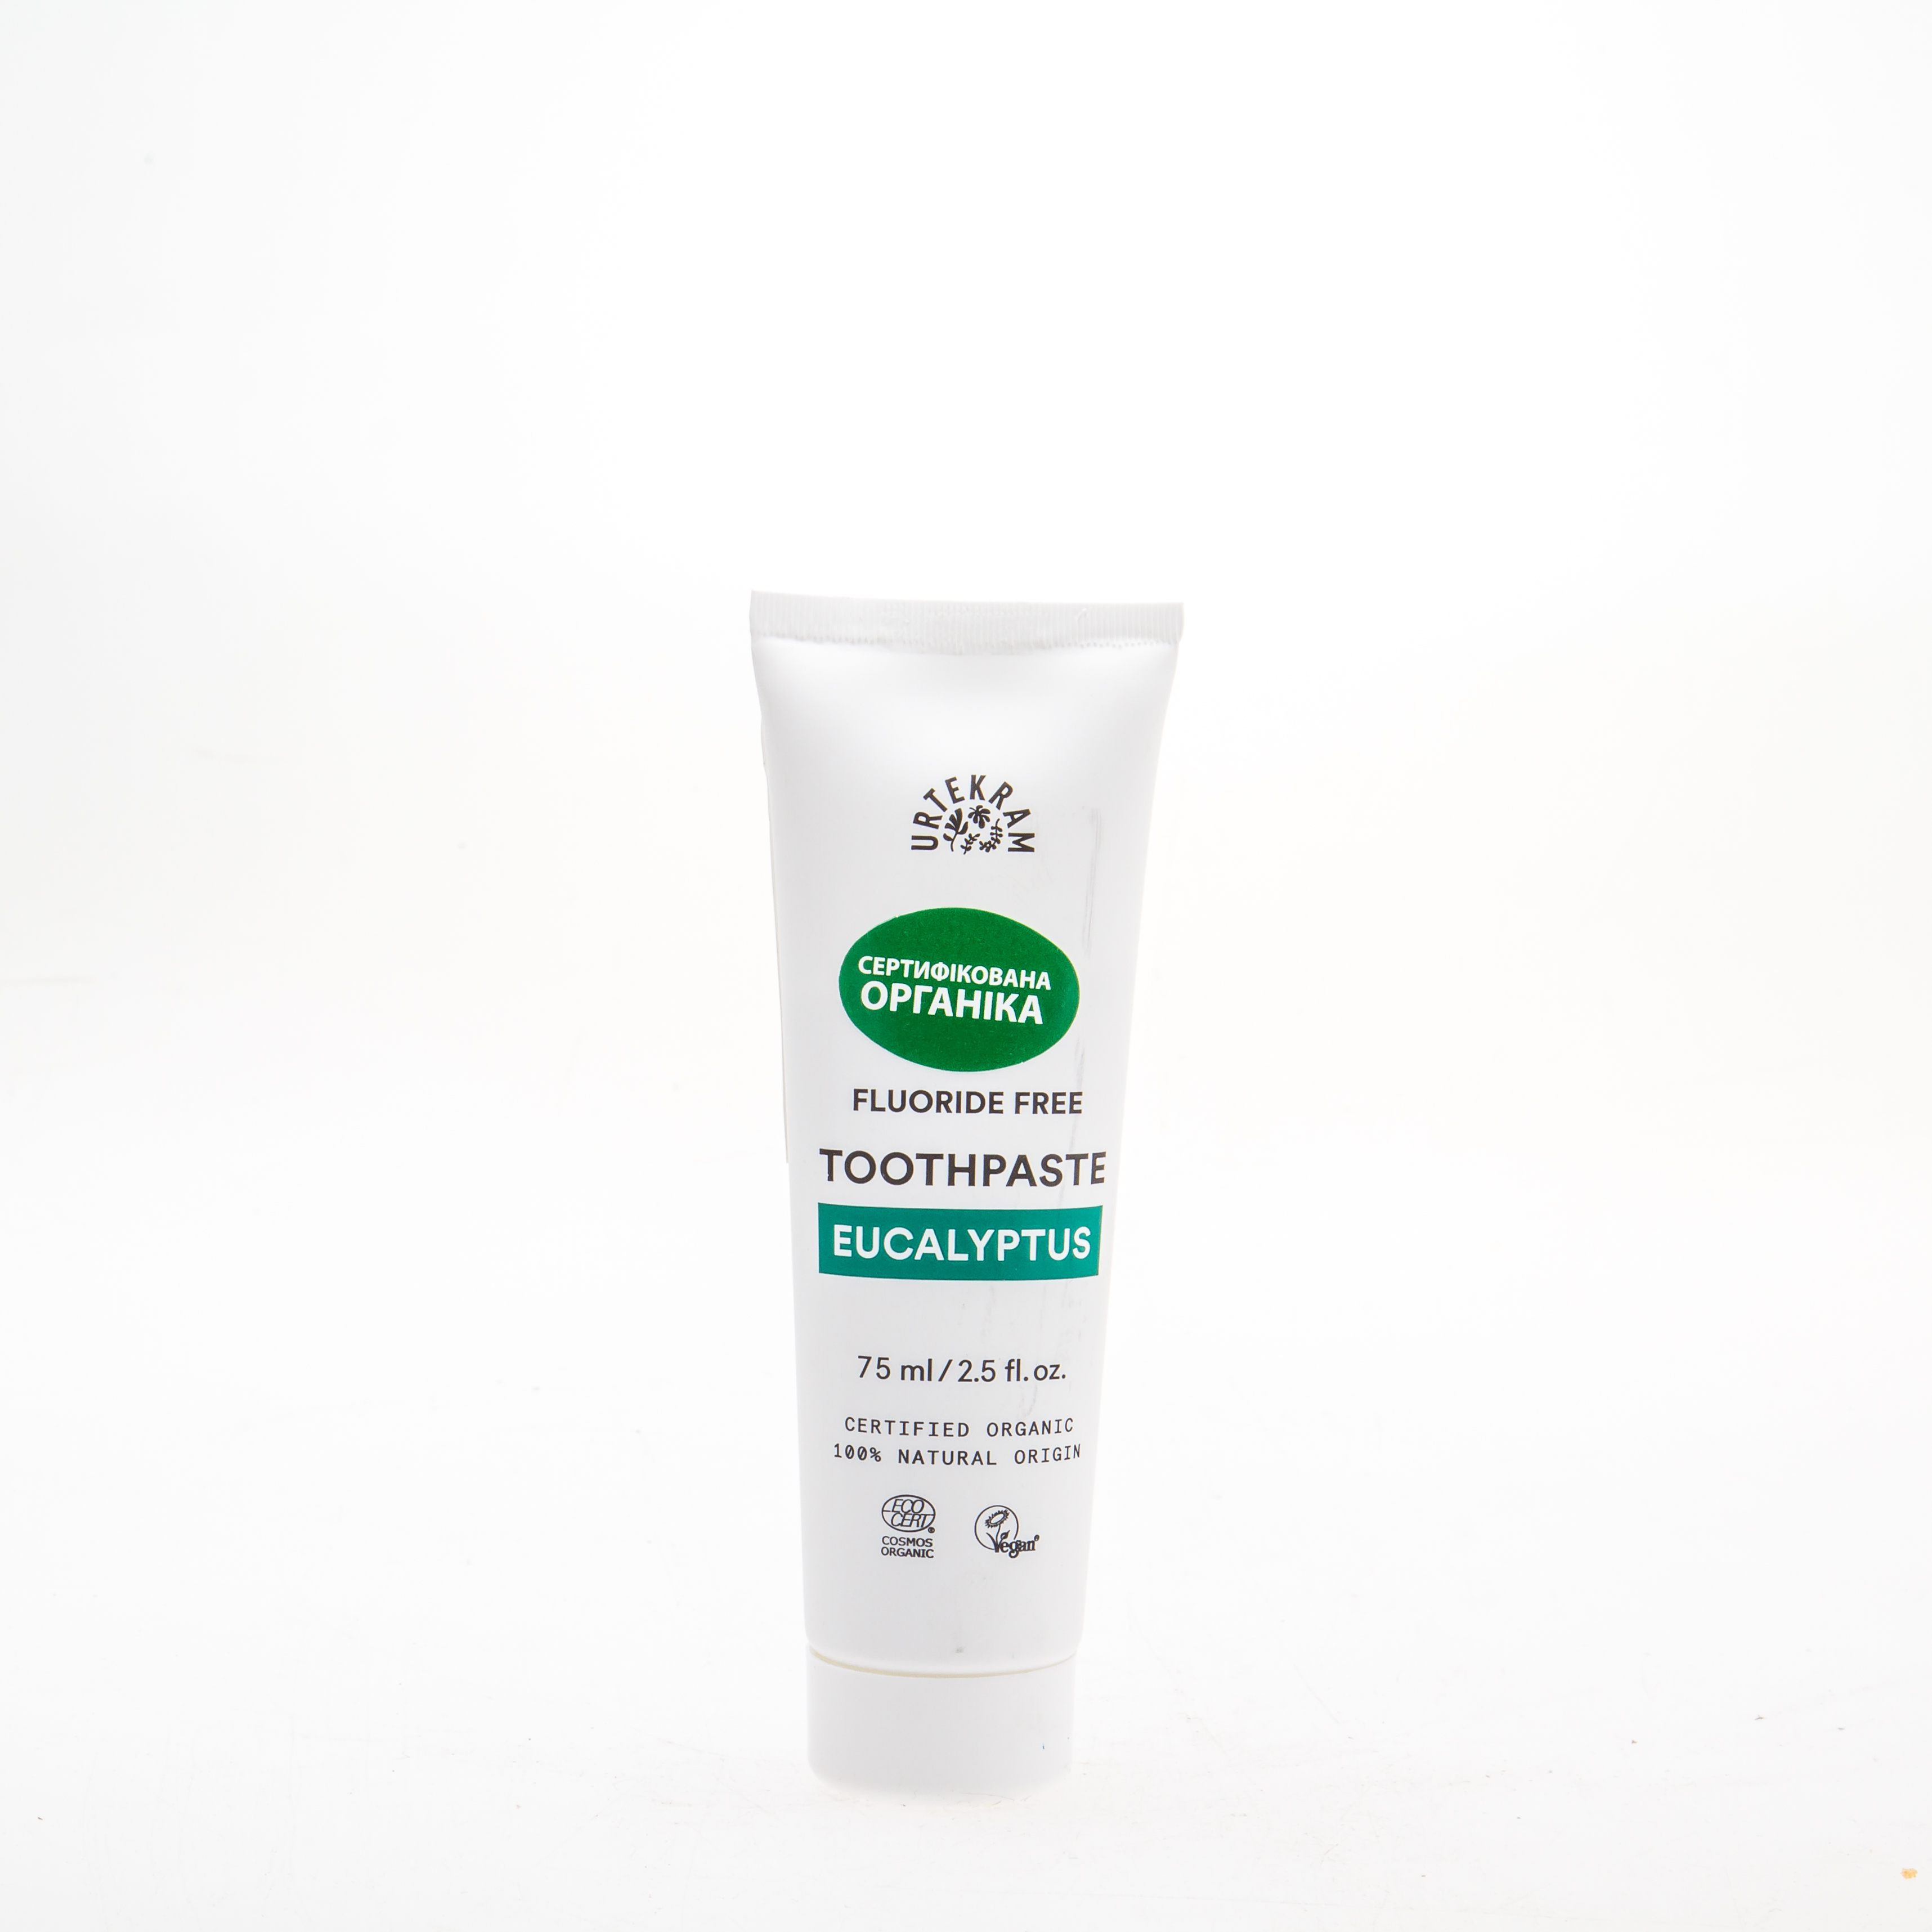 Urtekram Органічна зубна паста з Евкаліптом, 75мл - купить в интернет-магазине Юнимед